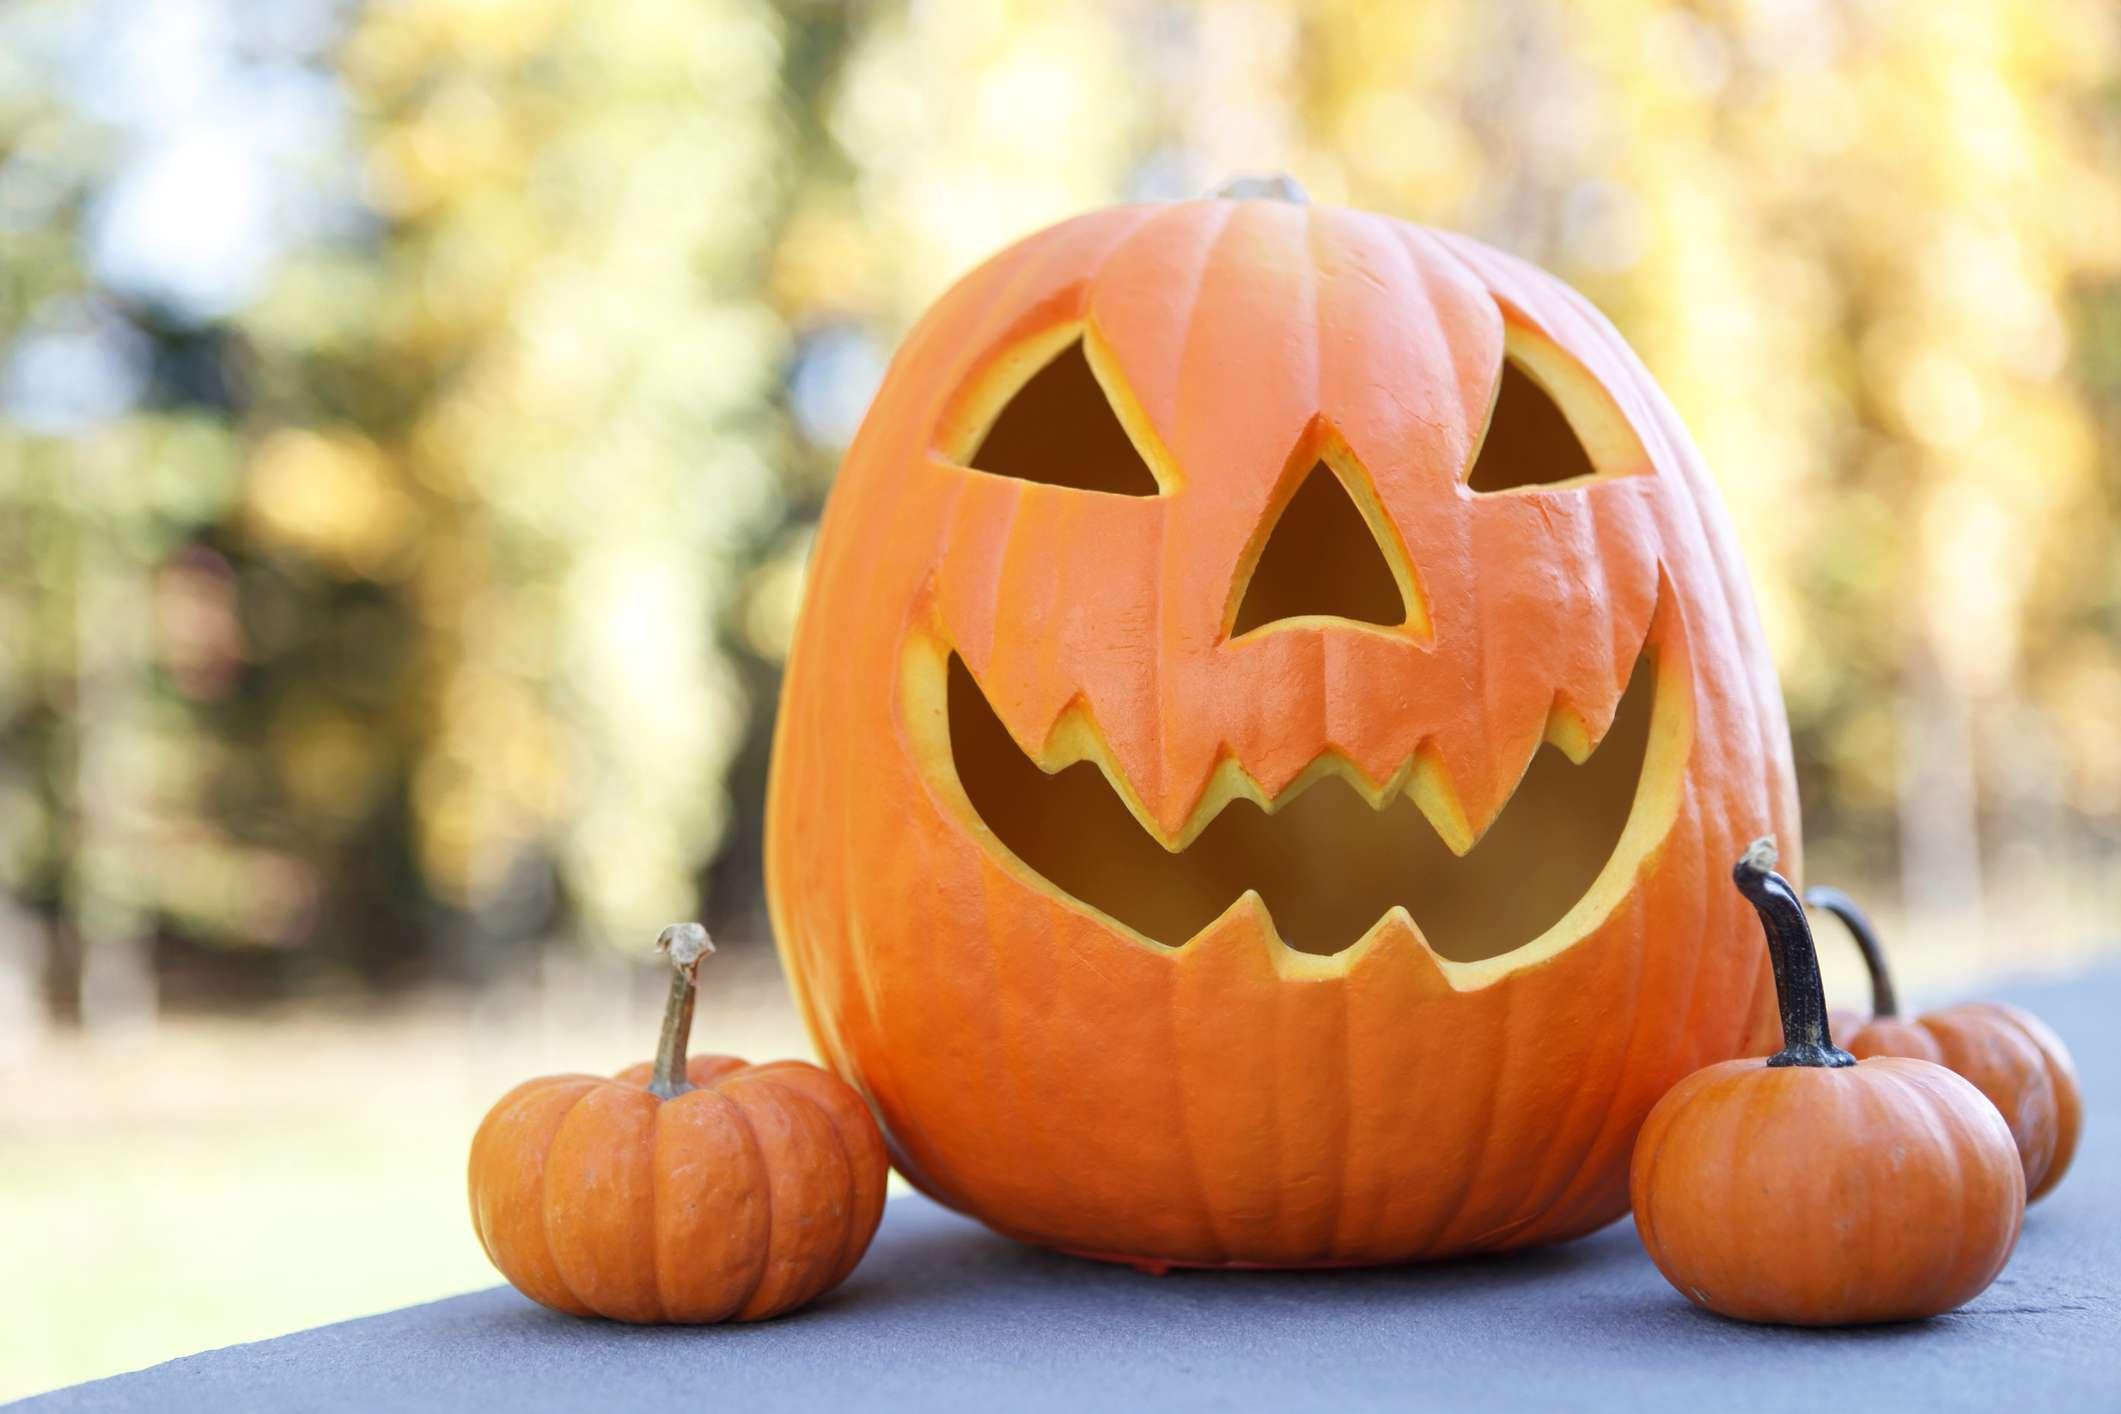 A jack o' lanten with small pumpkins